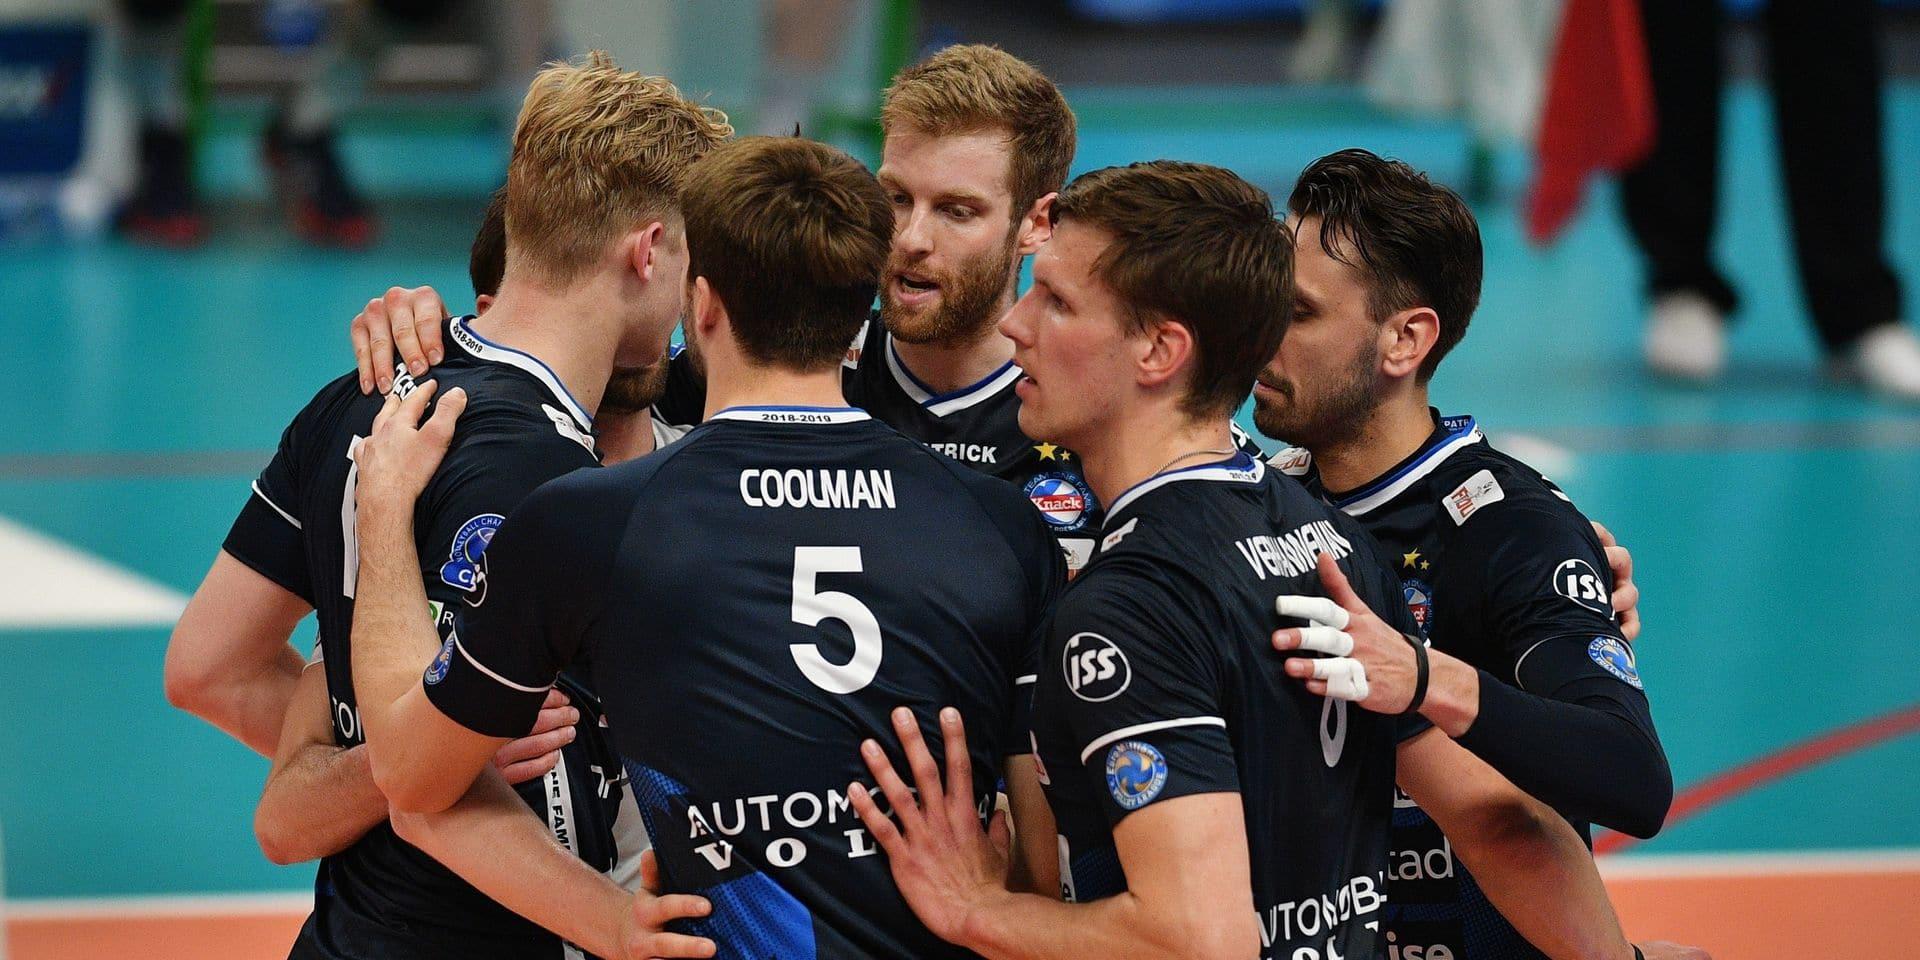 Volley-ball: Roulers a tenu un set face à Civitanova, la meilleure équipe du monde